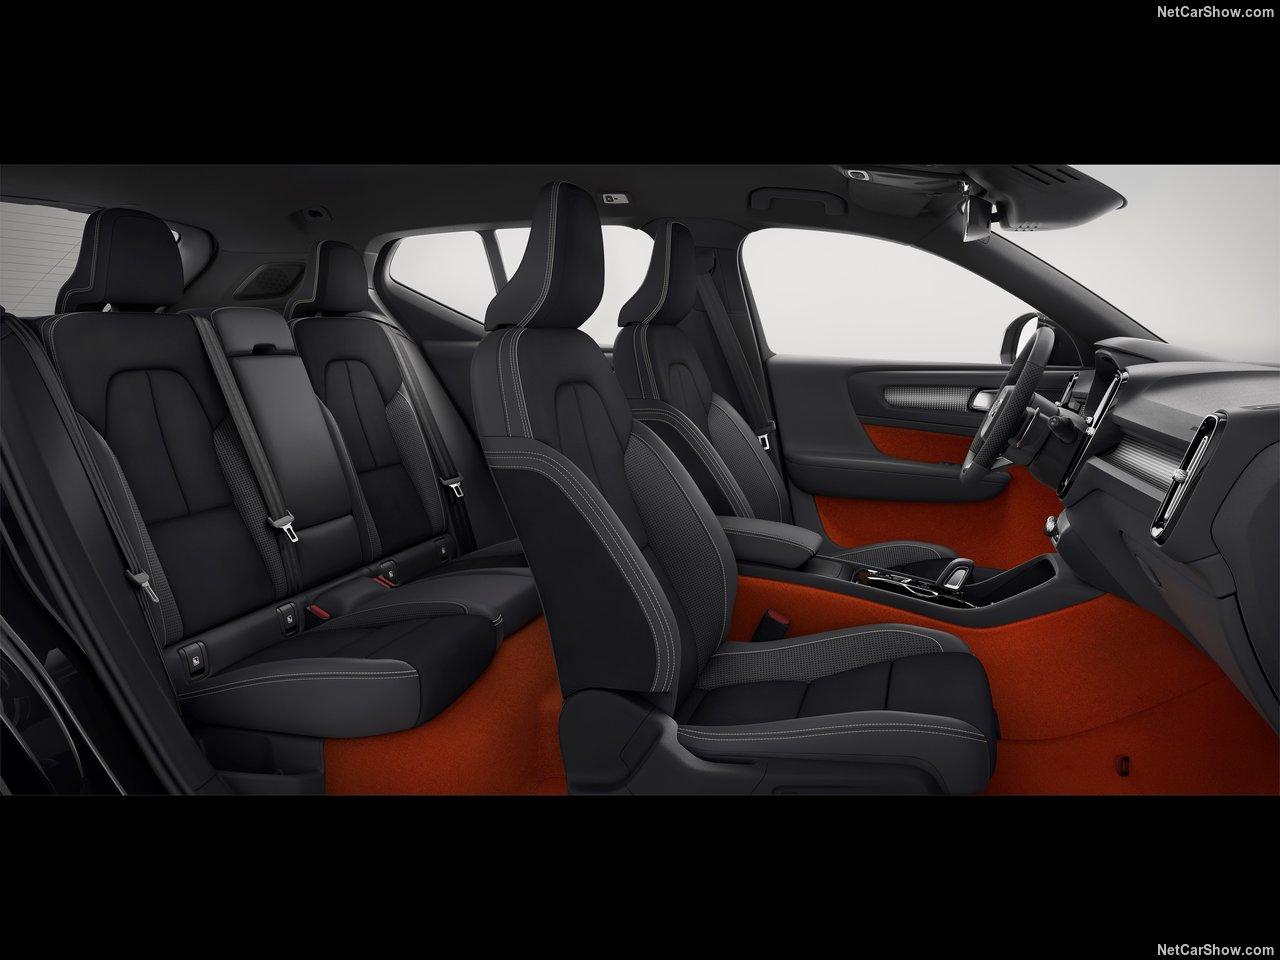 Volvo-XC40-2018-1280-99.jpg